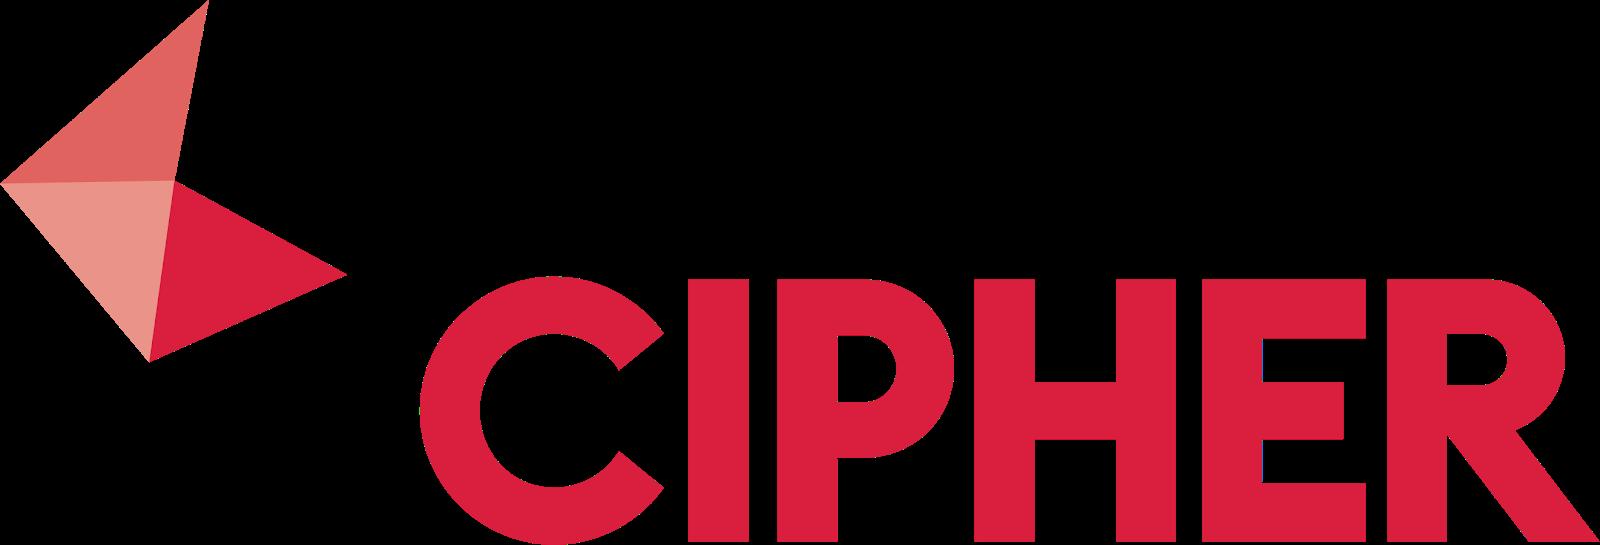 Cipher-patent-intelligence